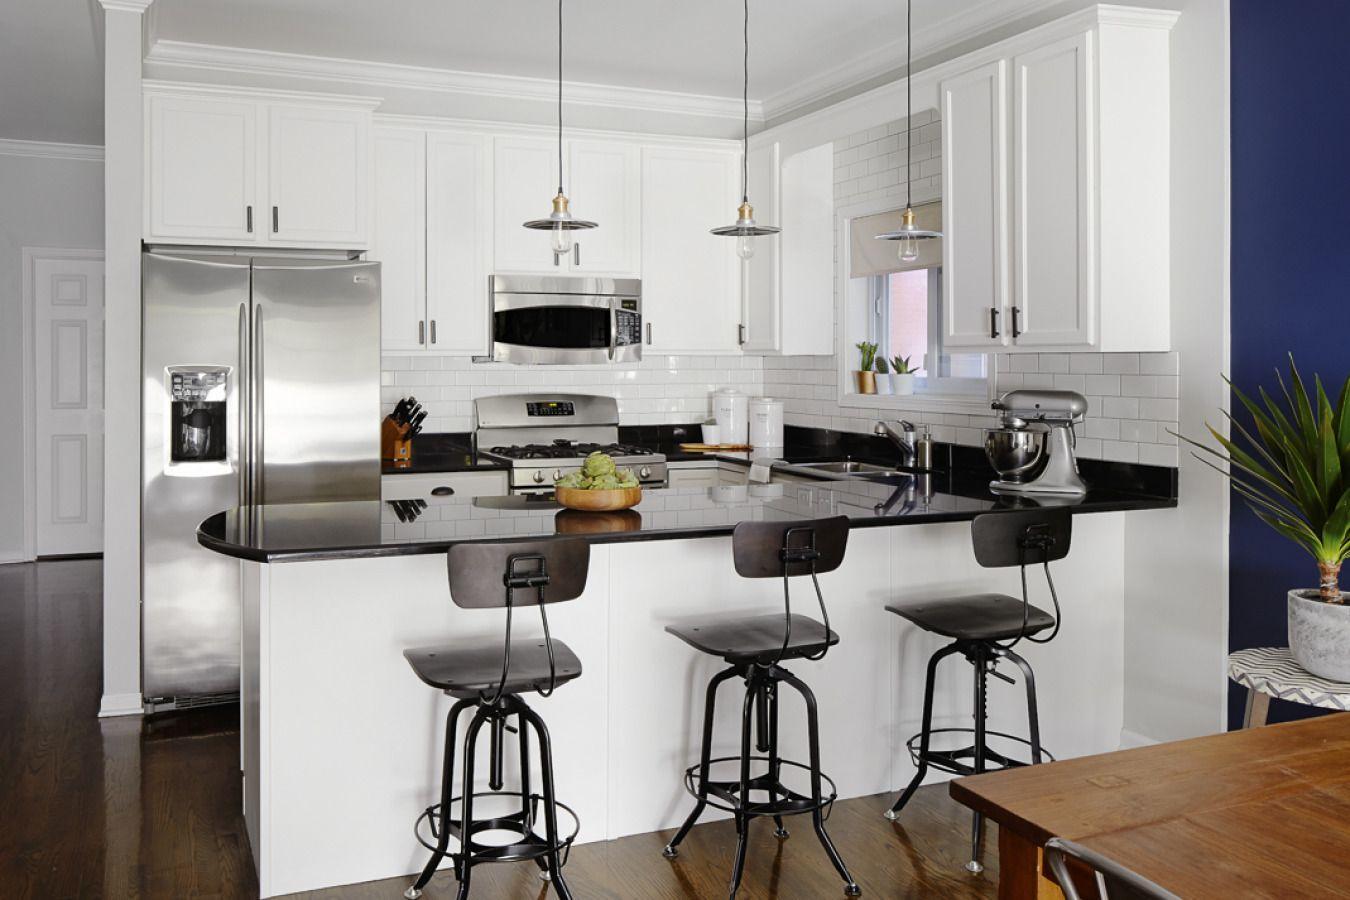 A Chicago Writer's Jeweled Home Kitchen peninsula, Chic